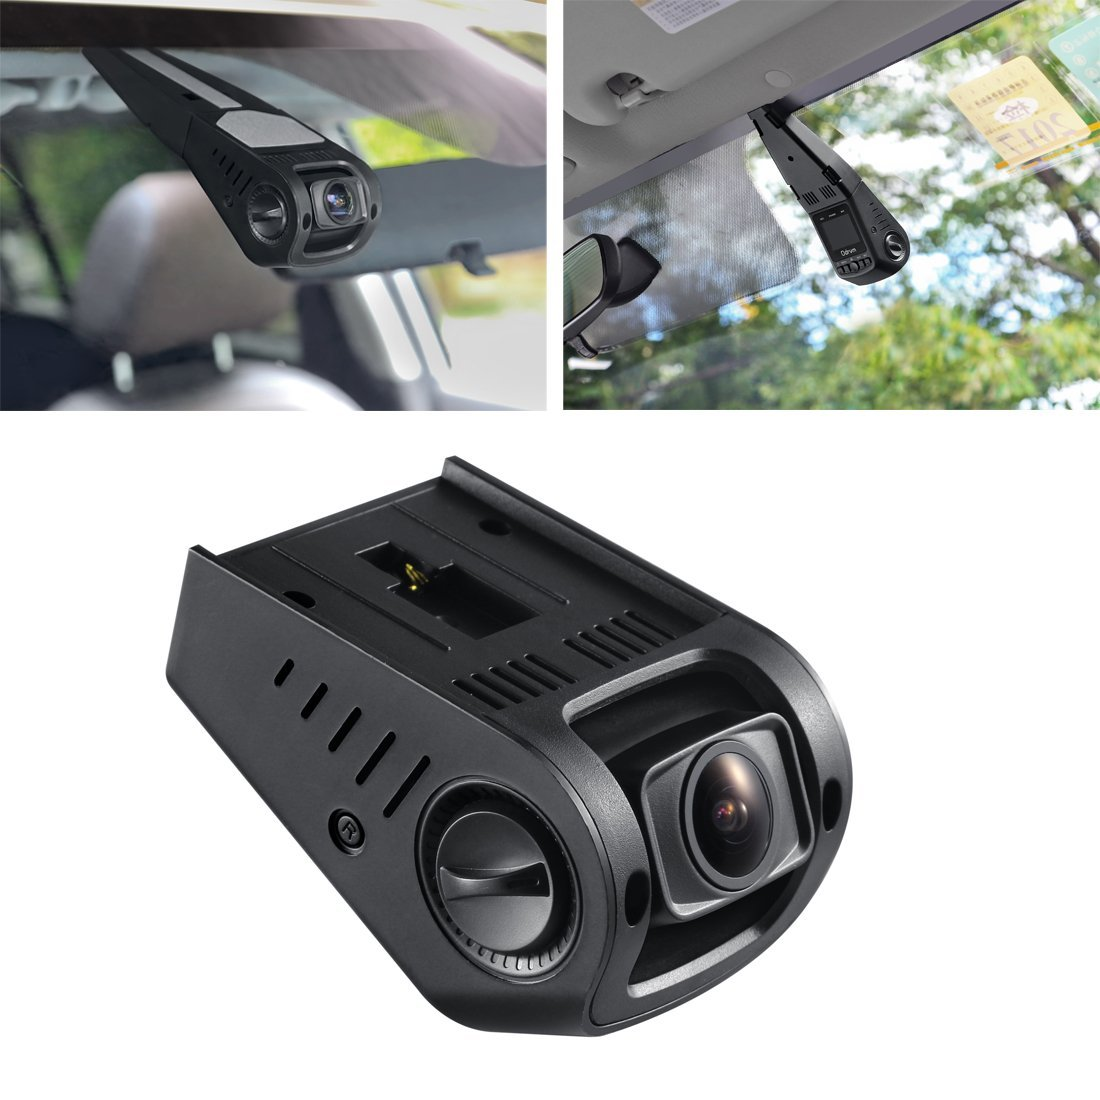 ODRVM Full HD 1080P Dash Cam for Cars Dashboard Camera: Amazon.co ...